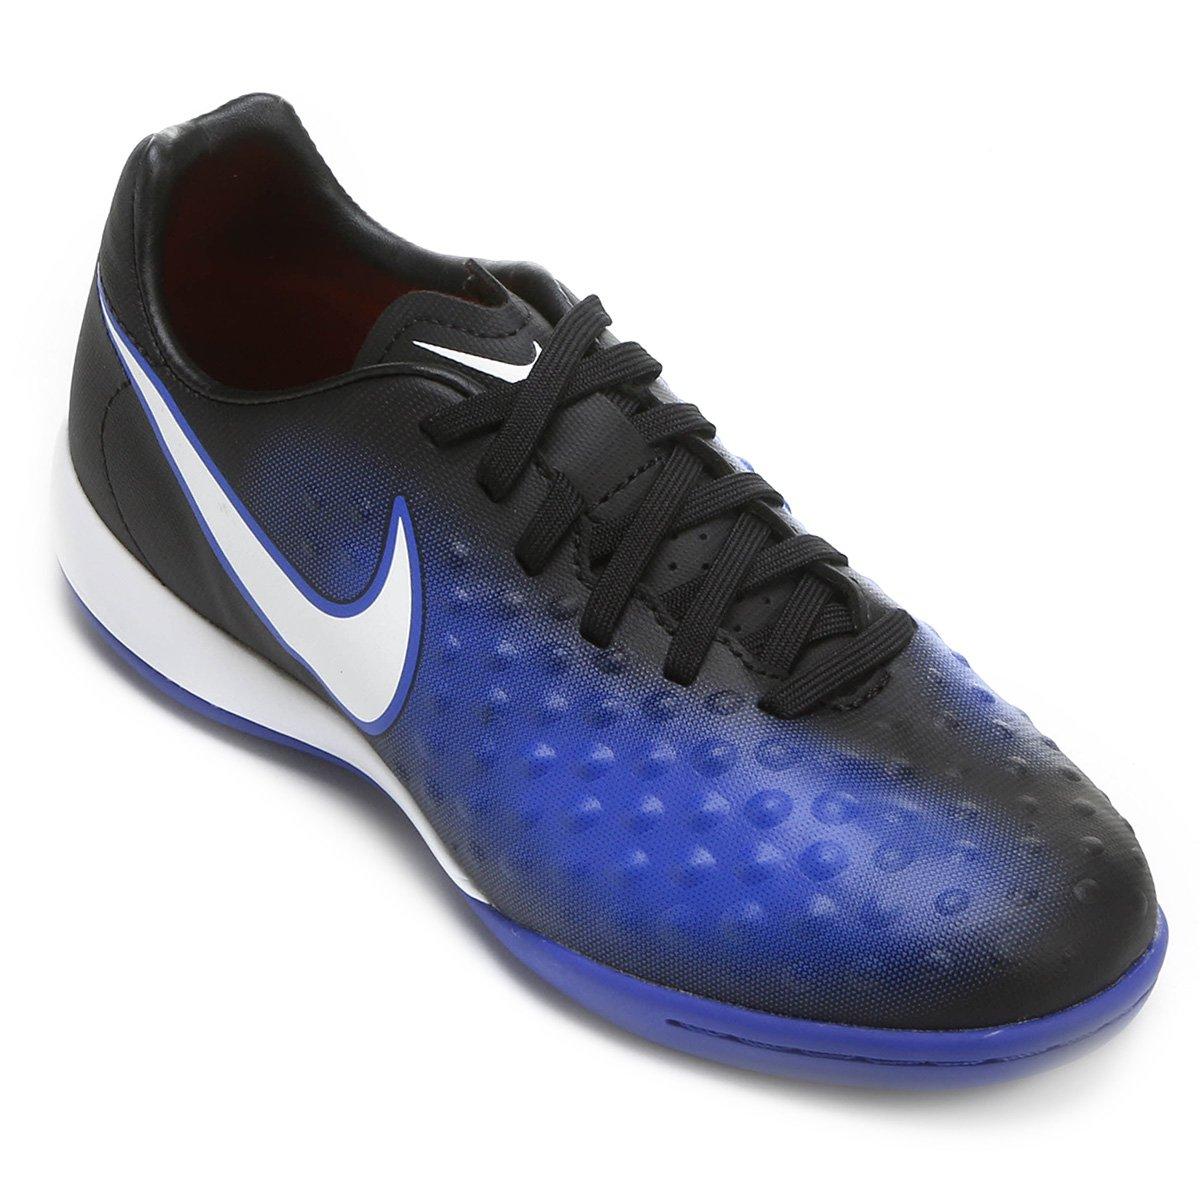 0b677f60ab977 Chuteira Futsal Infantil Nike Magista Opus II IC - Compre Agora ...